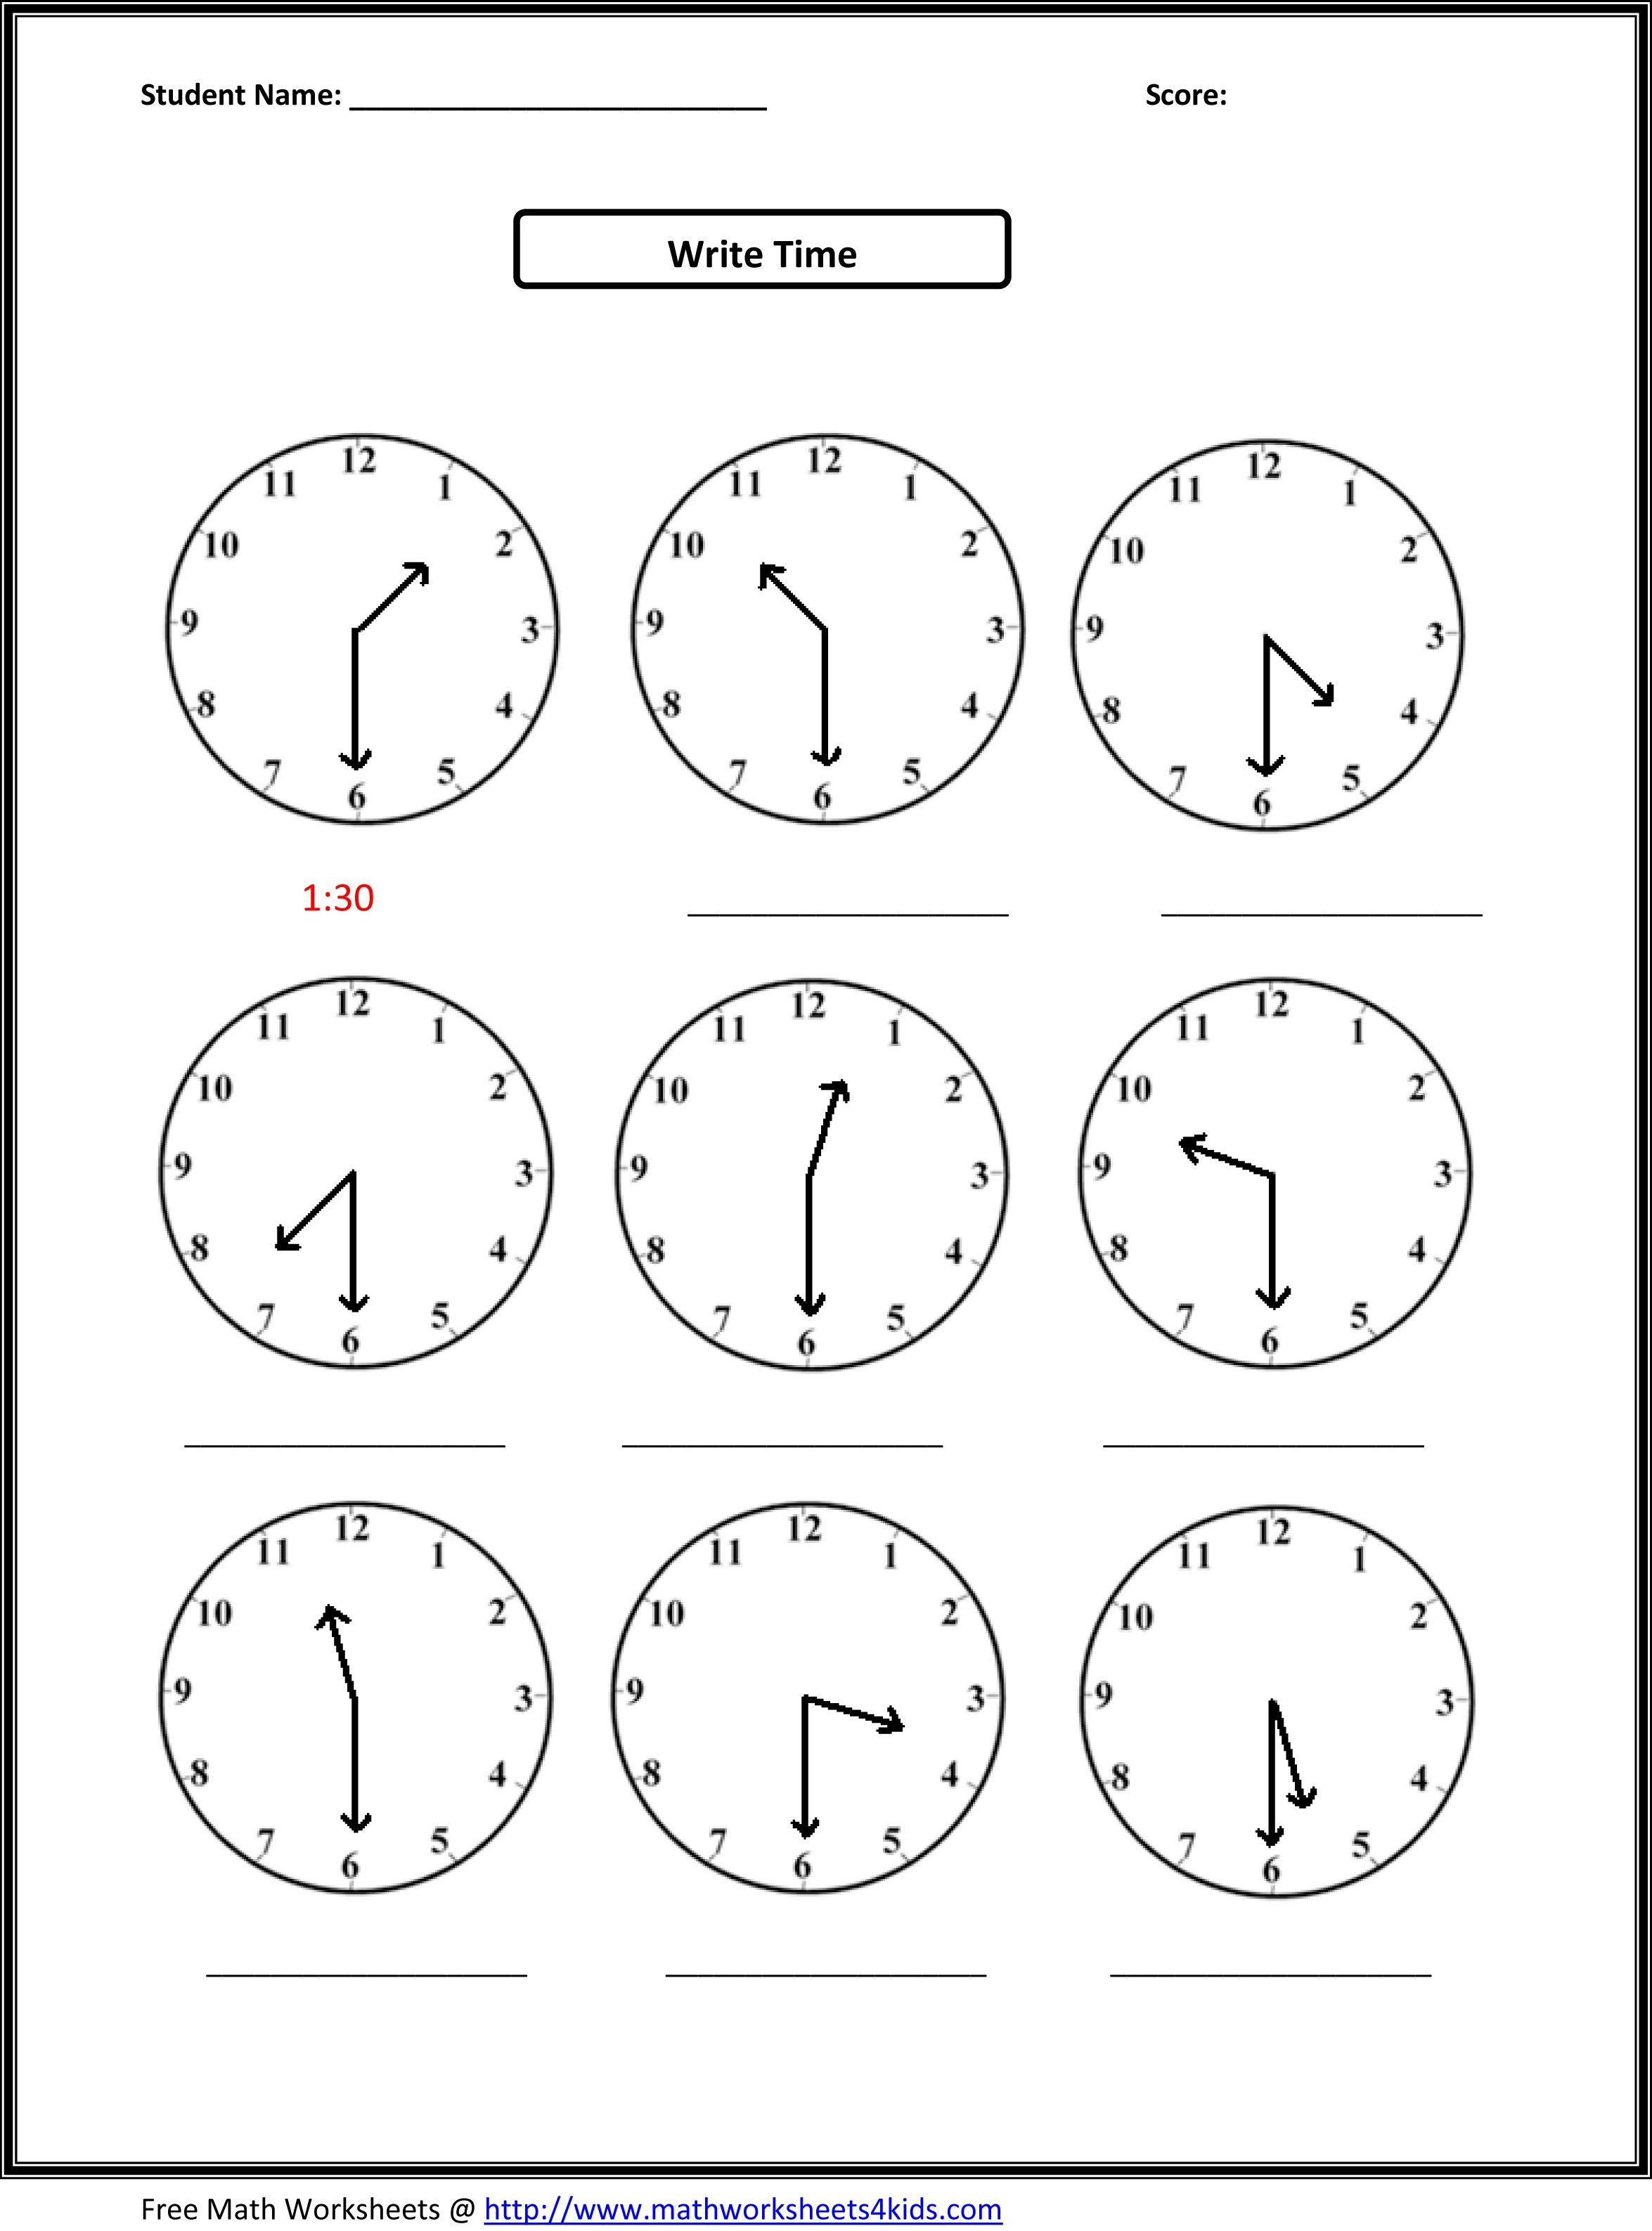 Free Printable Second Grade Math Worksheets » High School Worksheets - Free Printable Second Grade Math Worksheets